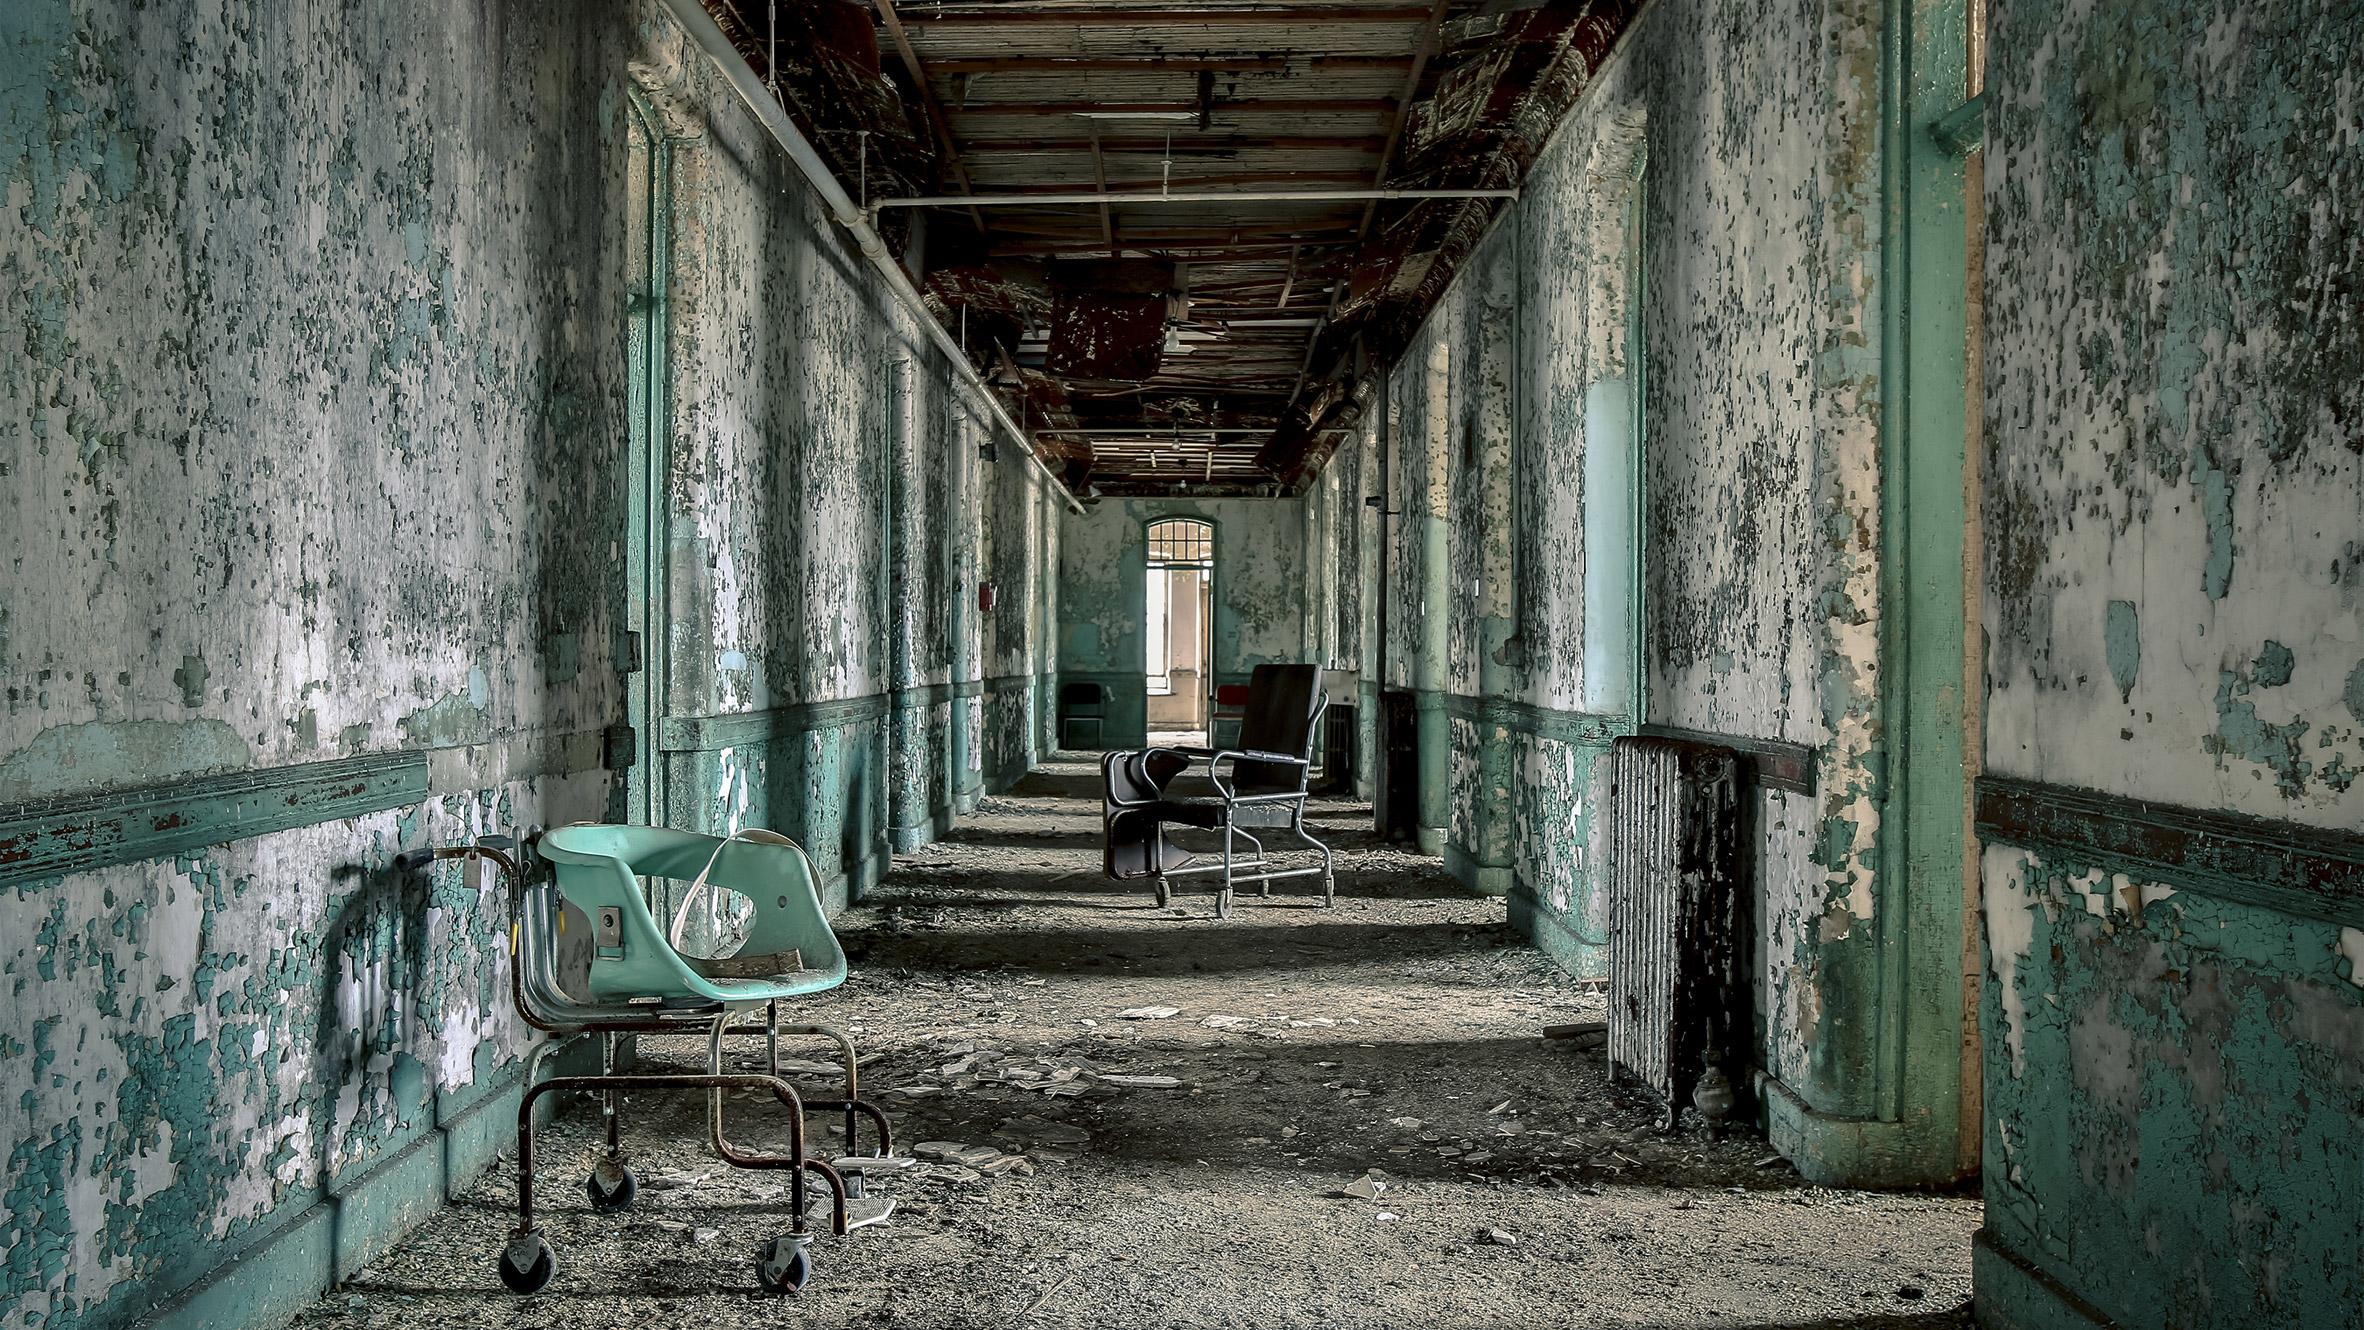 Abandoned-Asylums-2.jpg